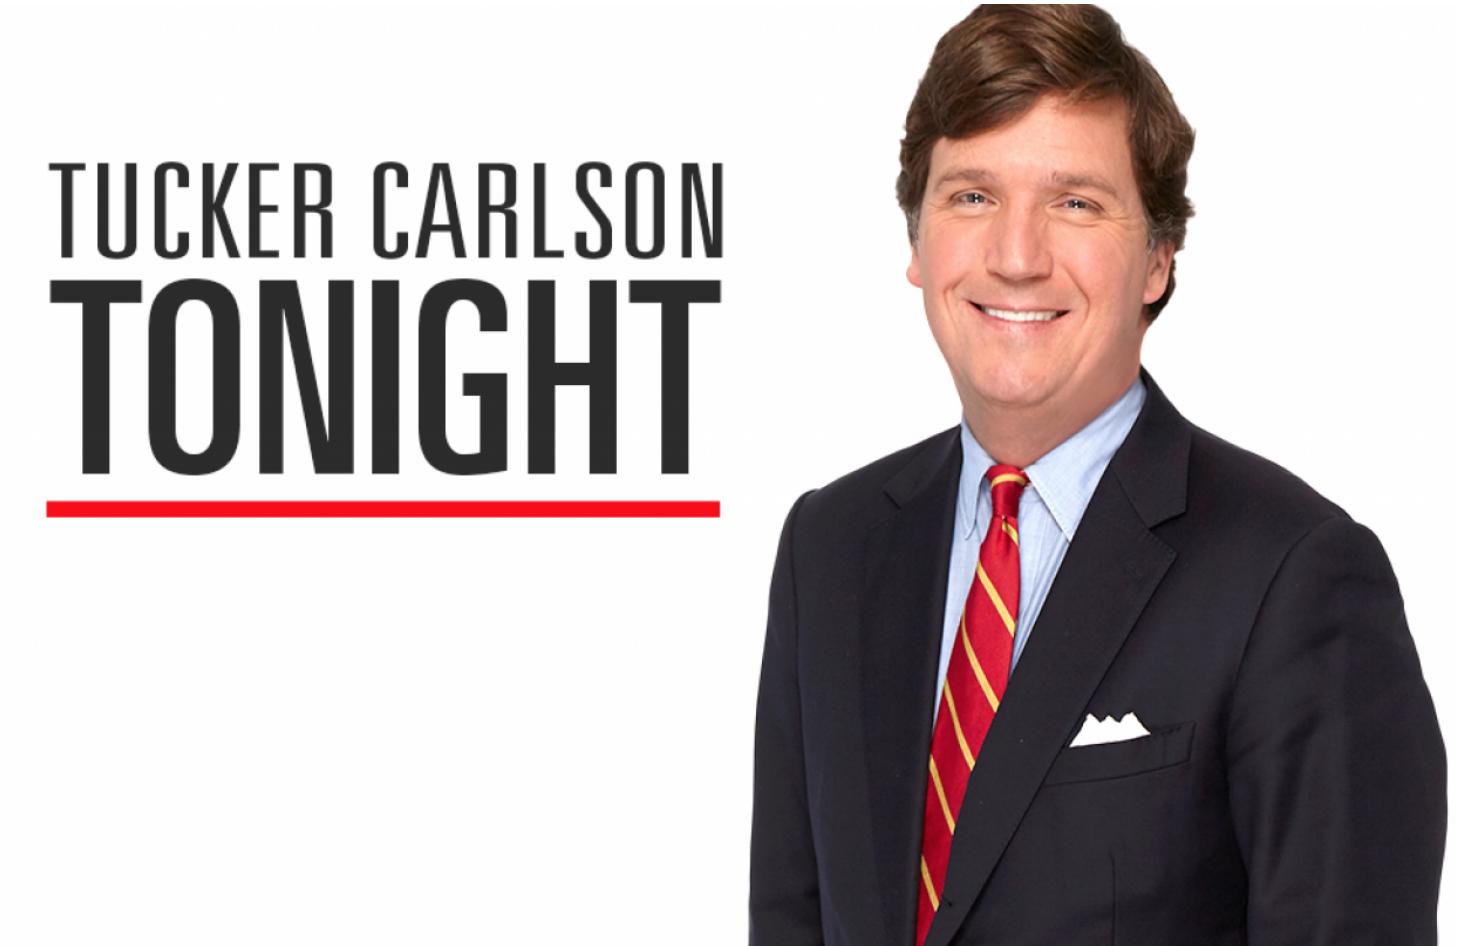 Tucker Carlson.png